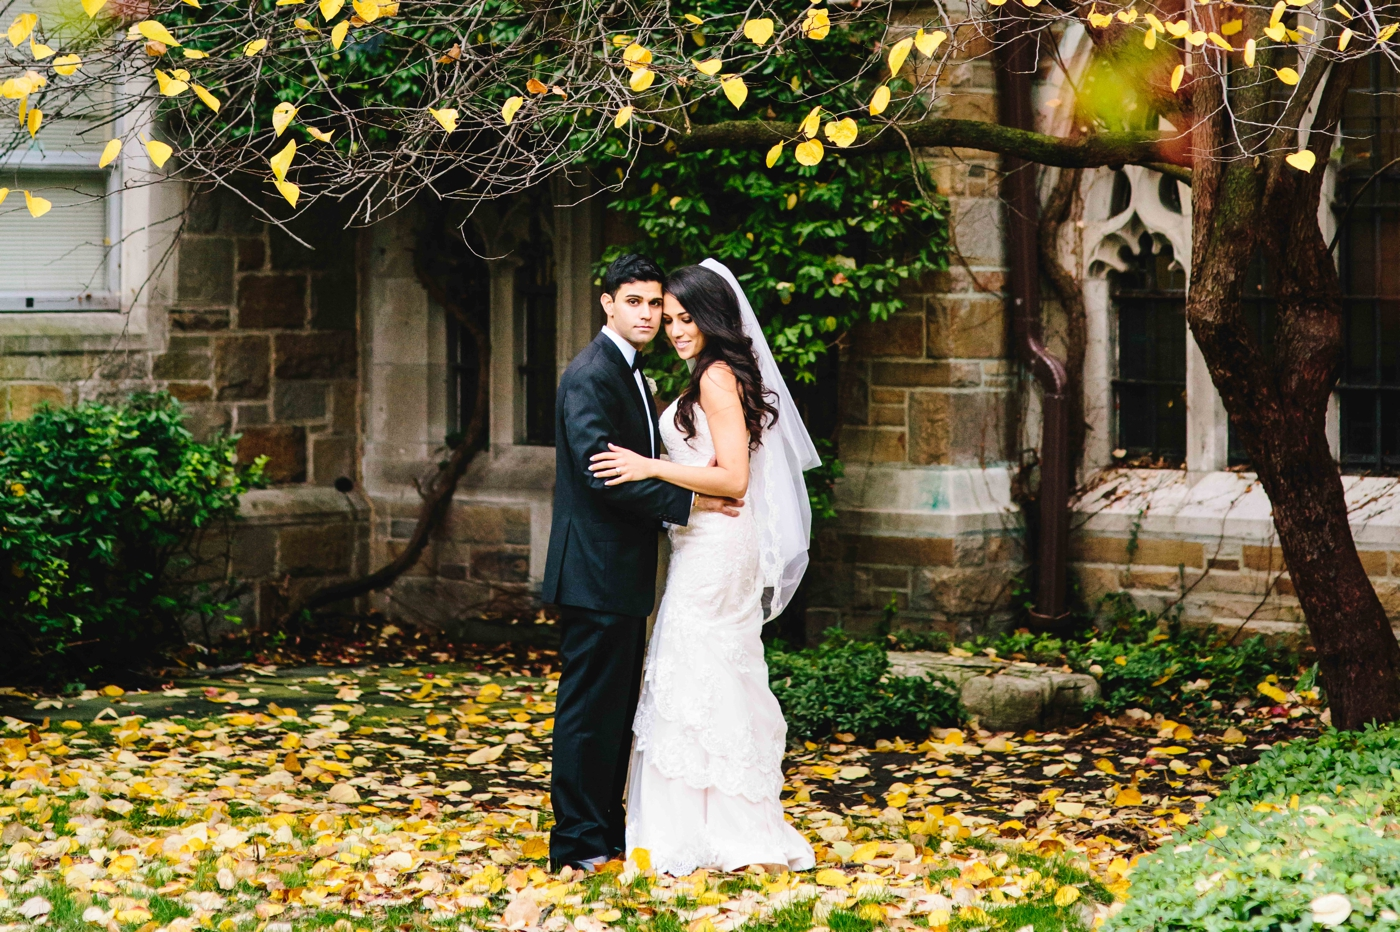 chicago-fine-art-wedding-photography-alfano16